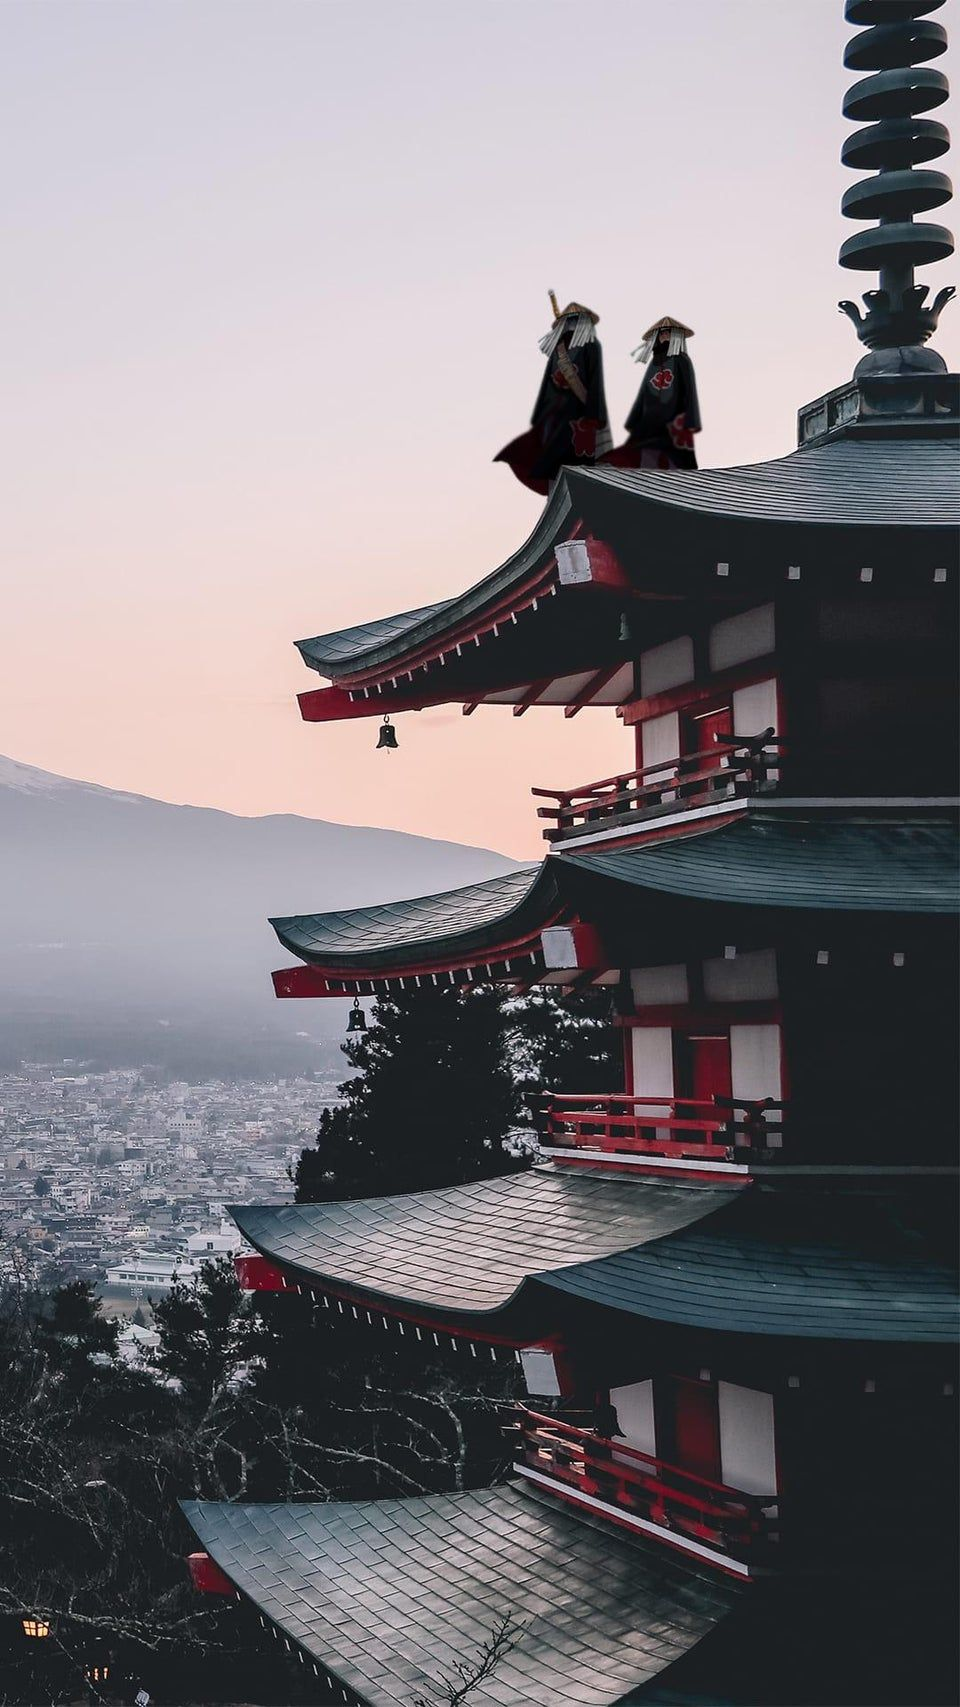 Akatsuki in Japan [1080p x 1920p]